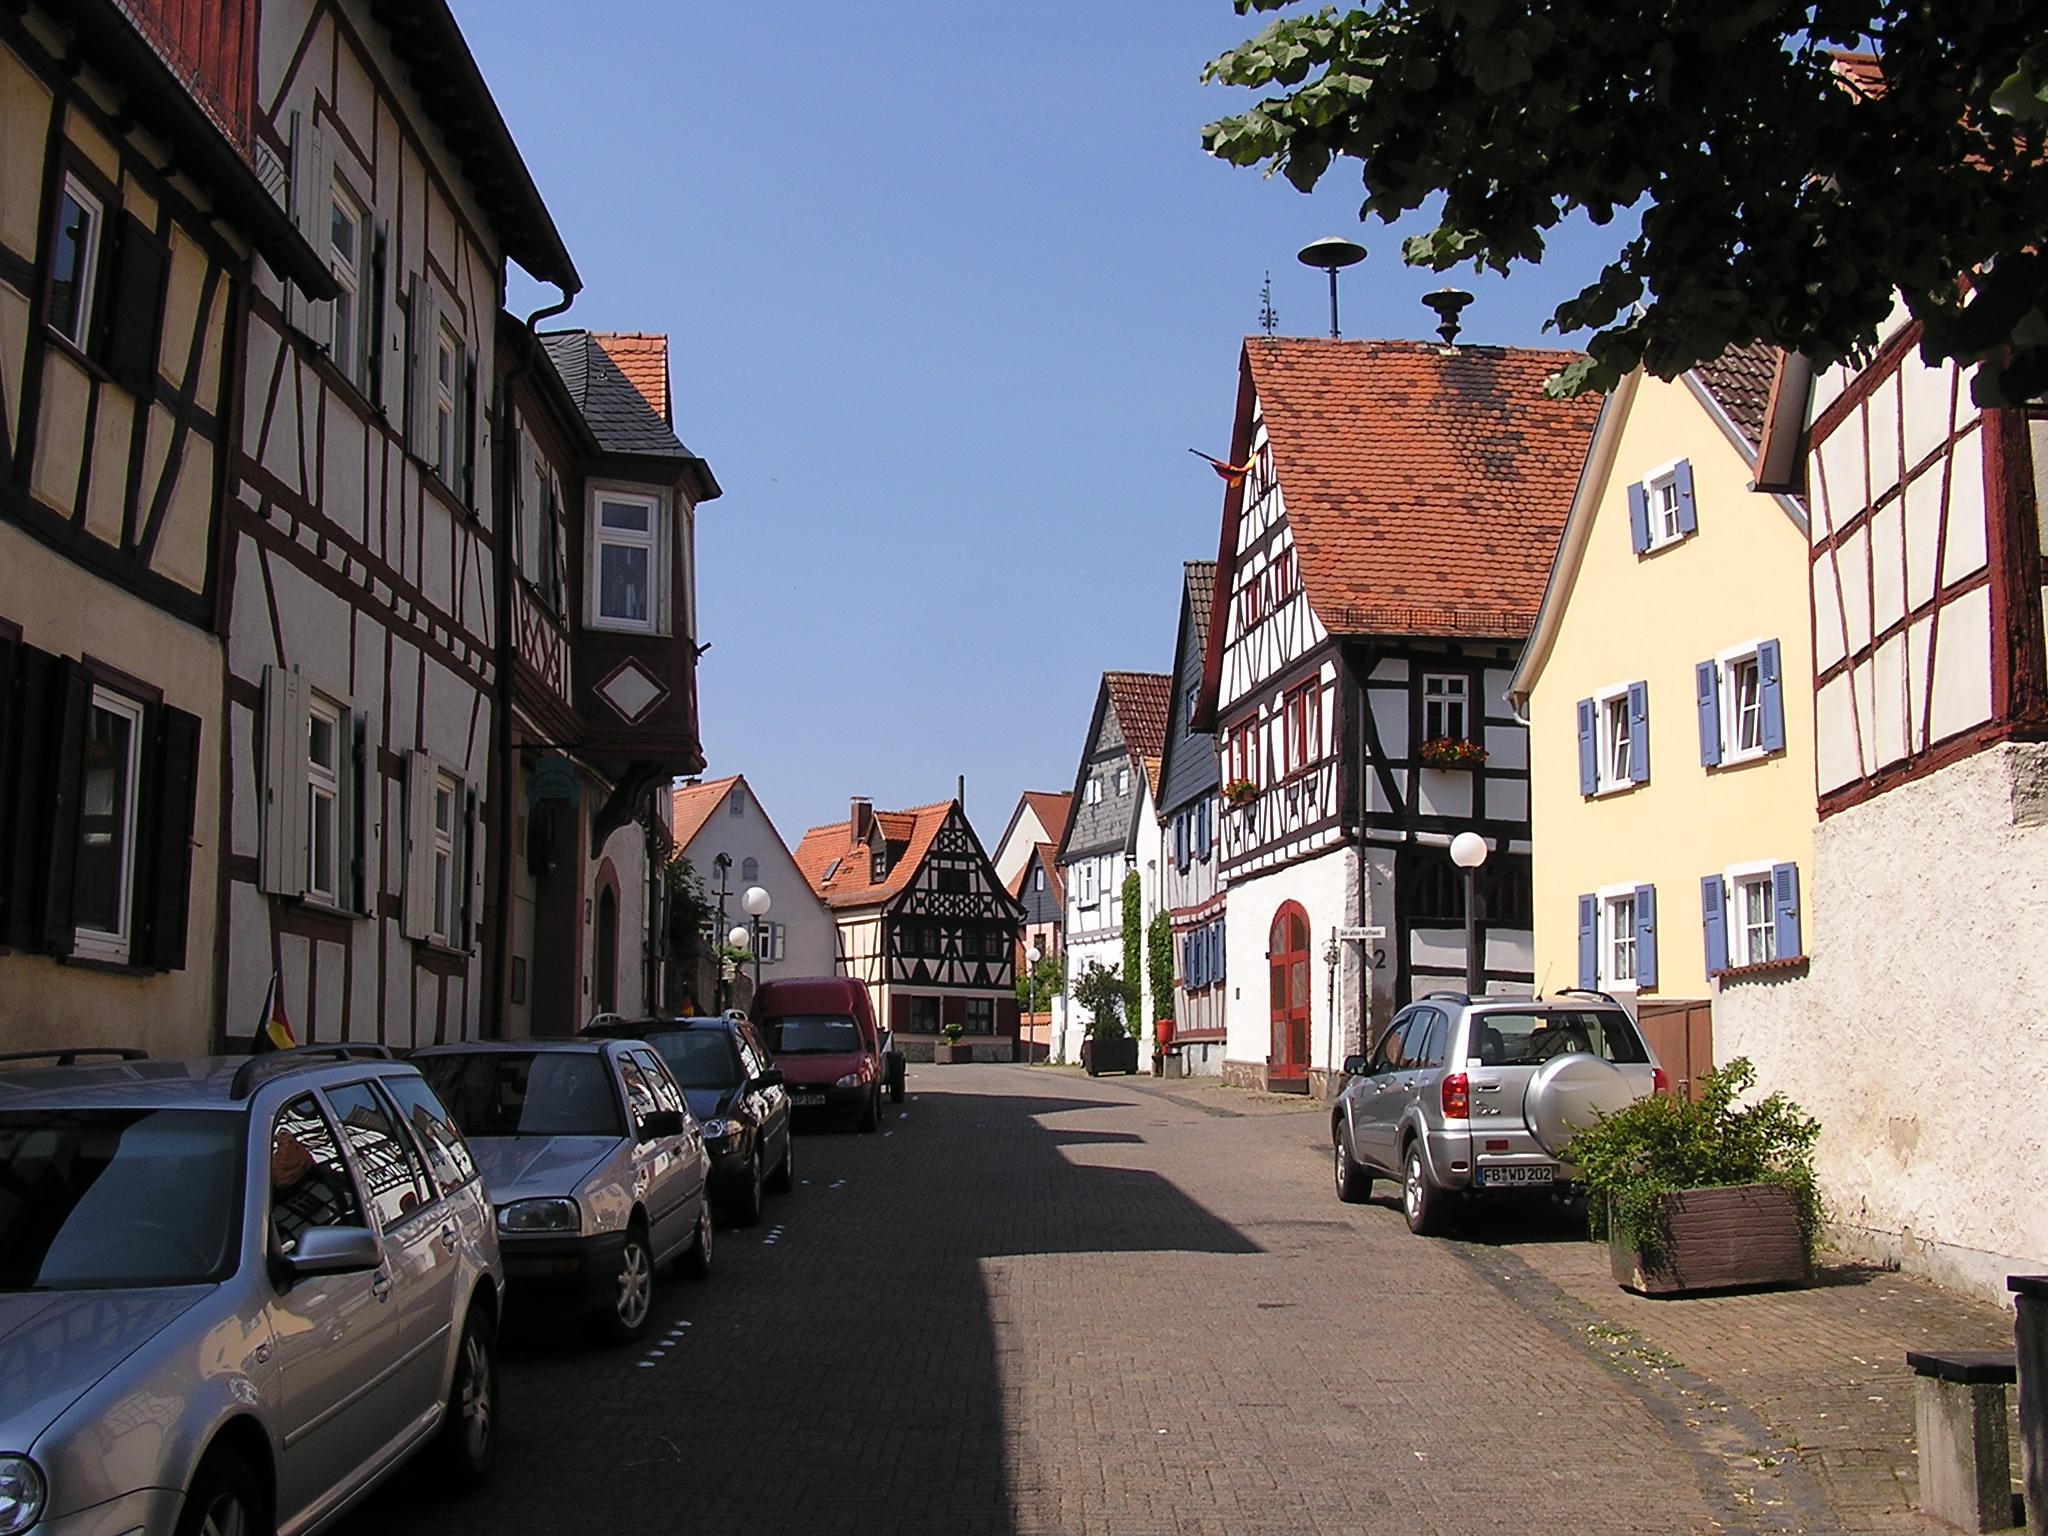 Friedrichsdorf Germany  City pictures : Picha:Friedrichsdorf TS Alt Burgholzhausen Wikipedia, kamusi ...